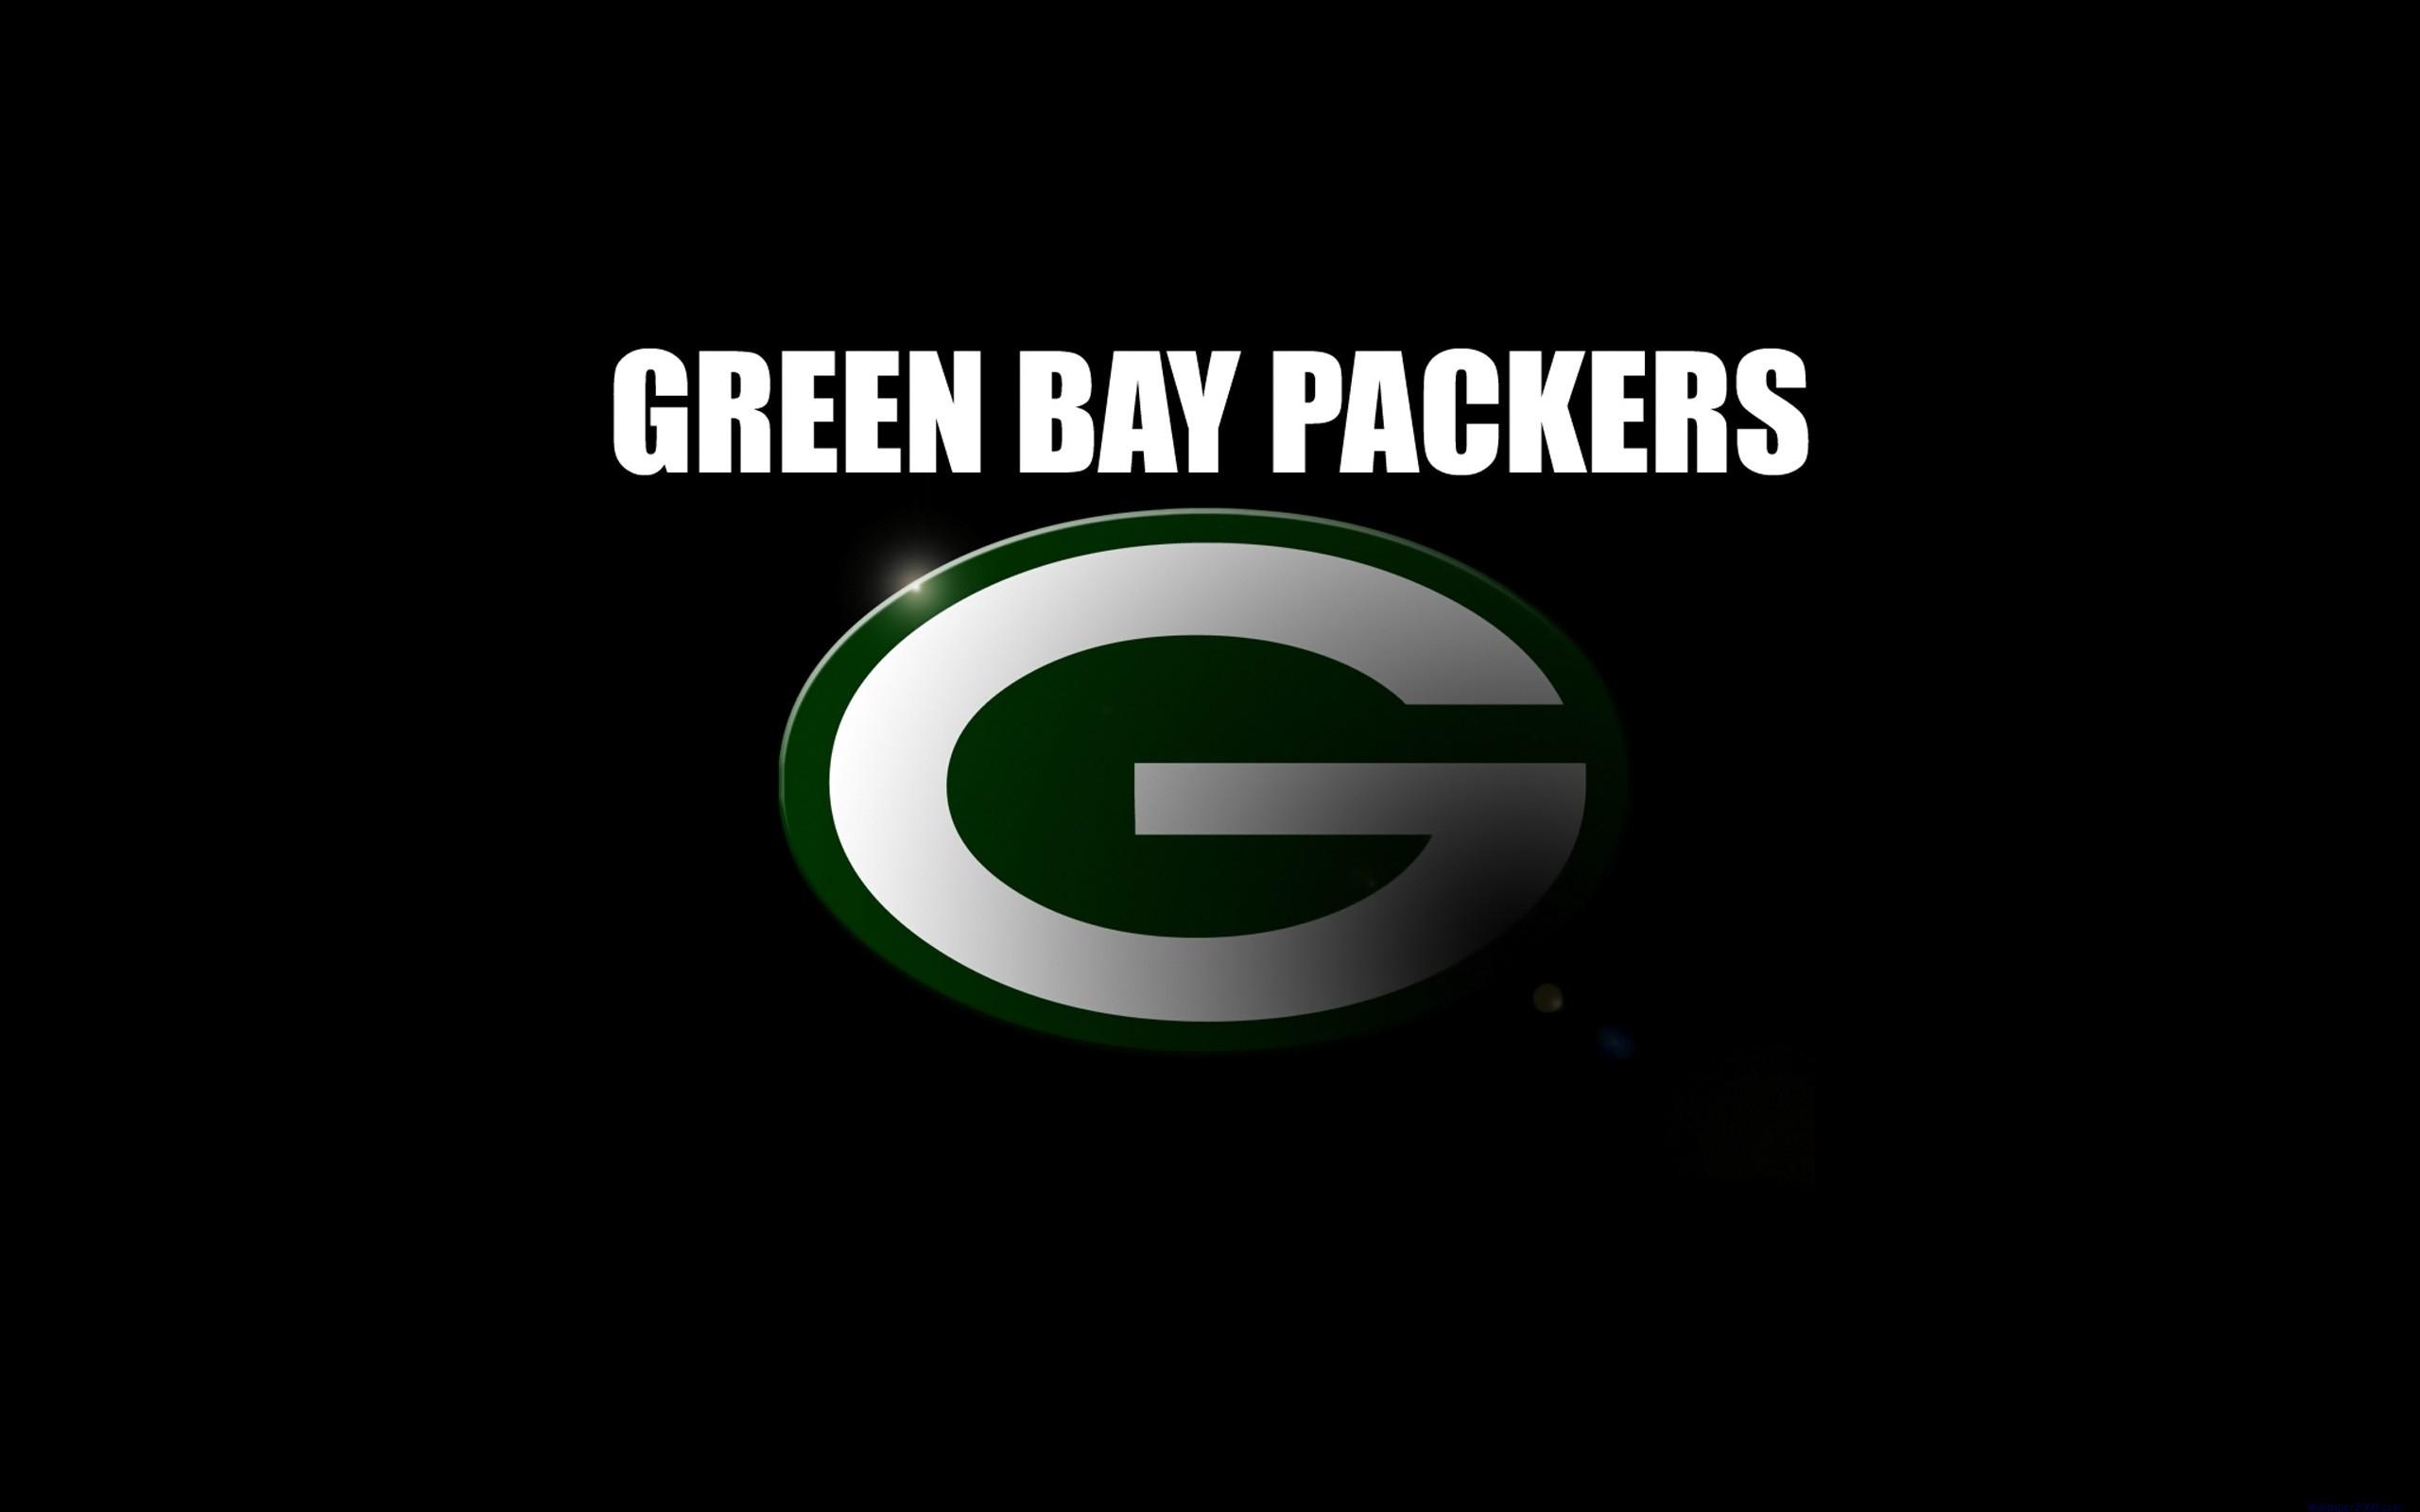 green bay packers nfl png logo wallpaper